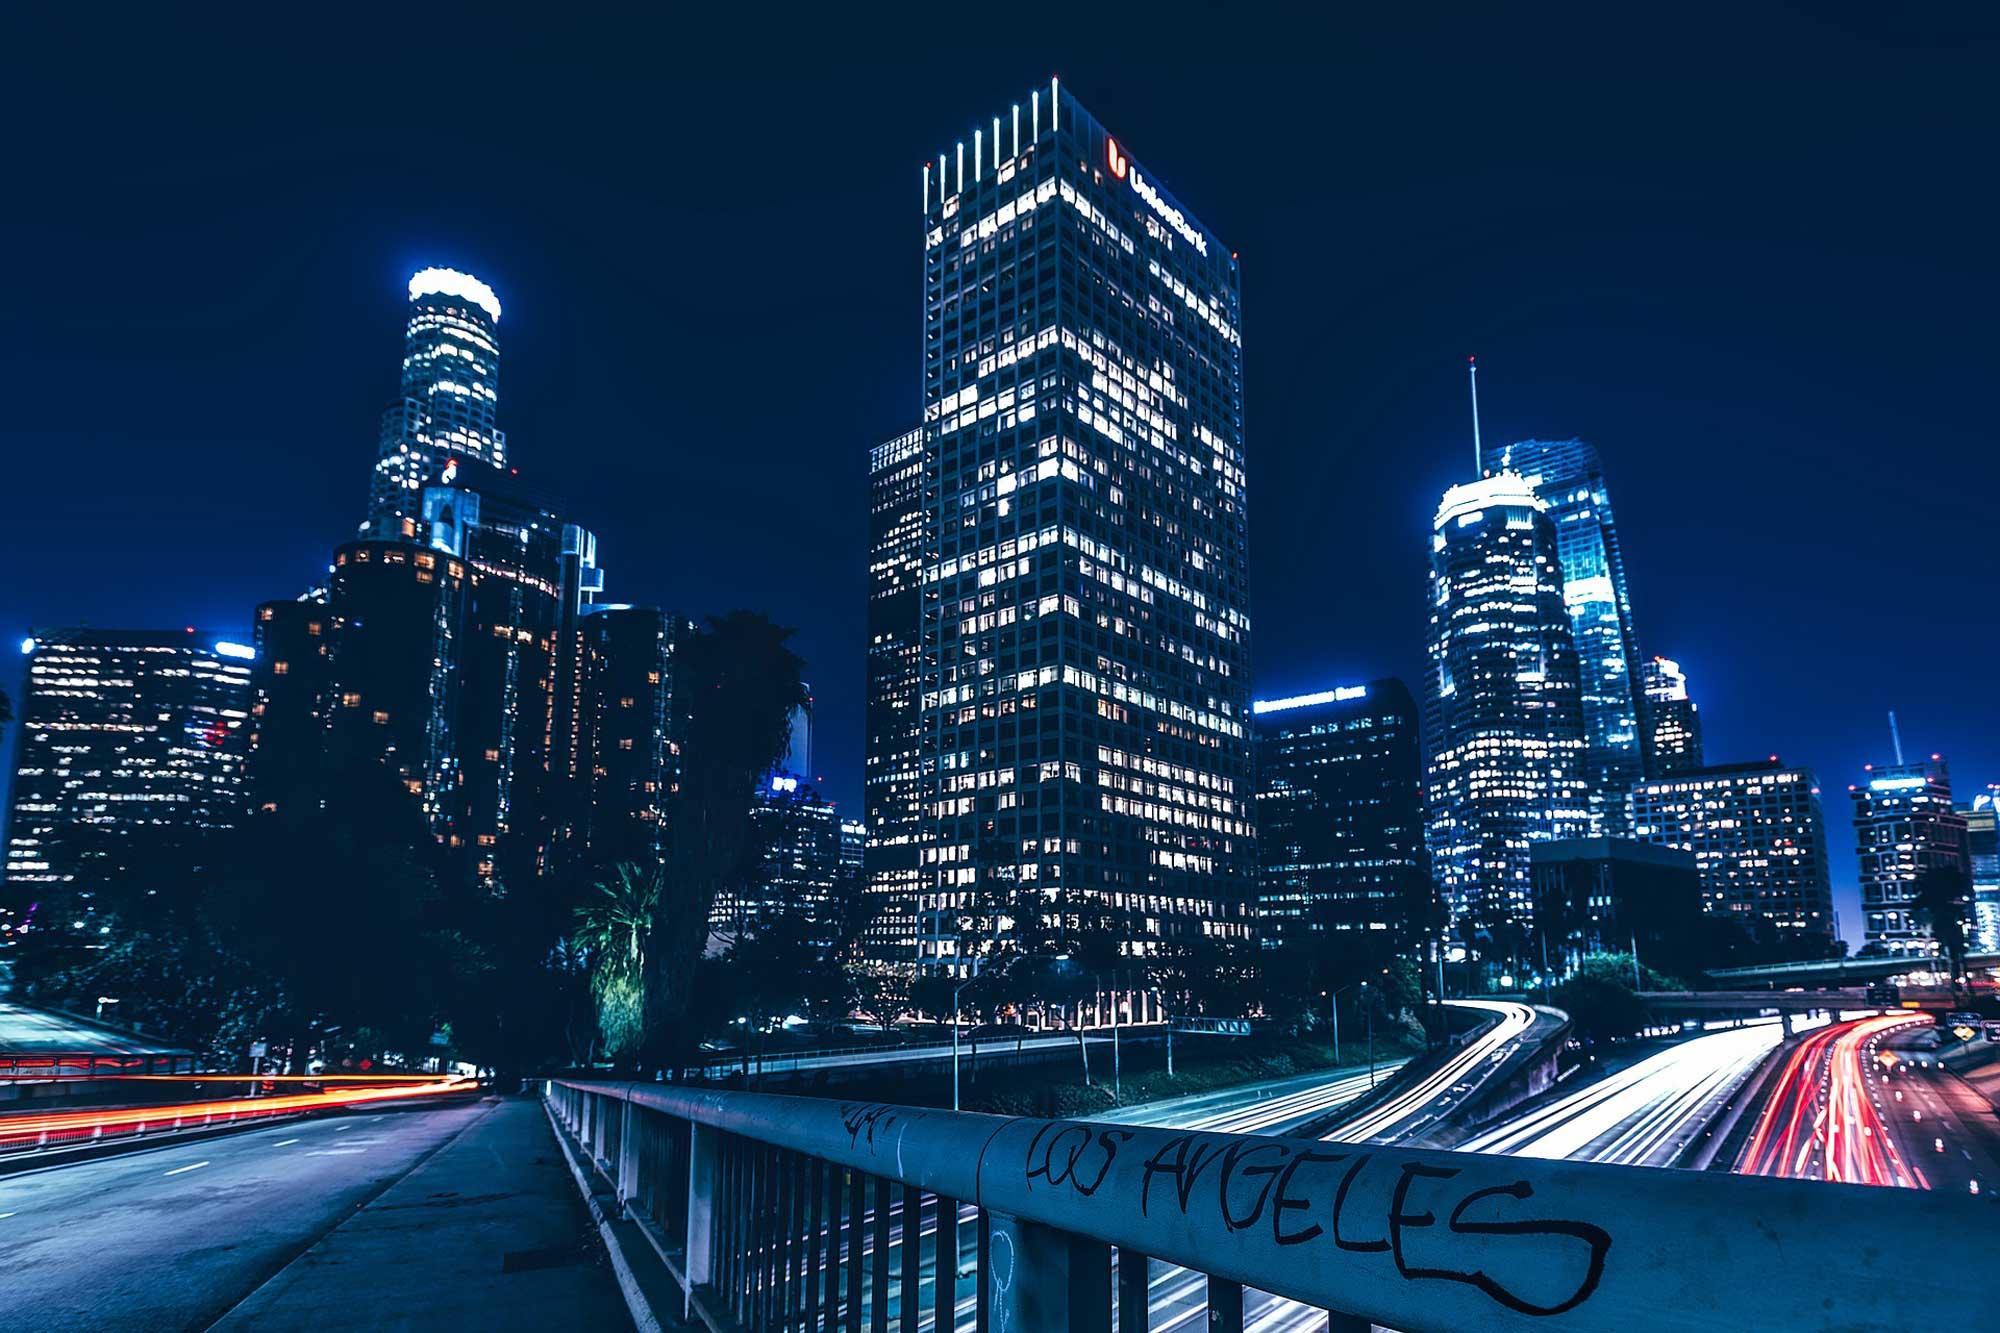 Zabrana Airbnb Los Angeles